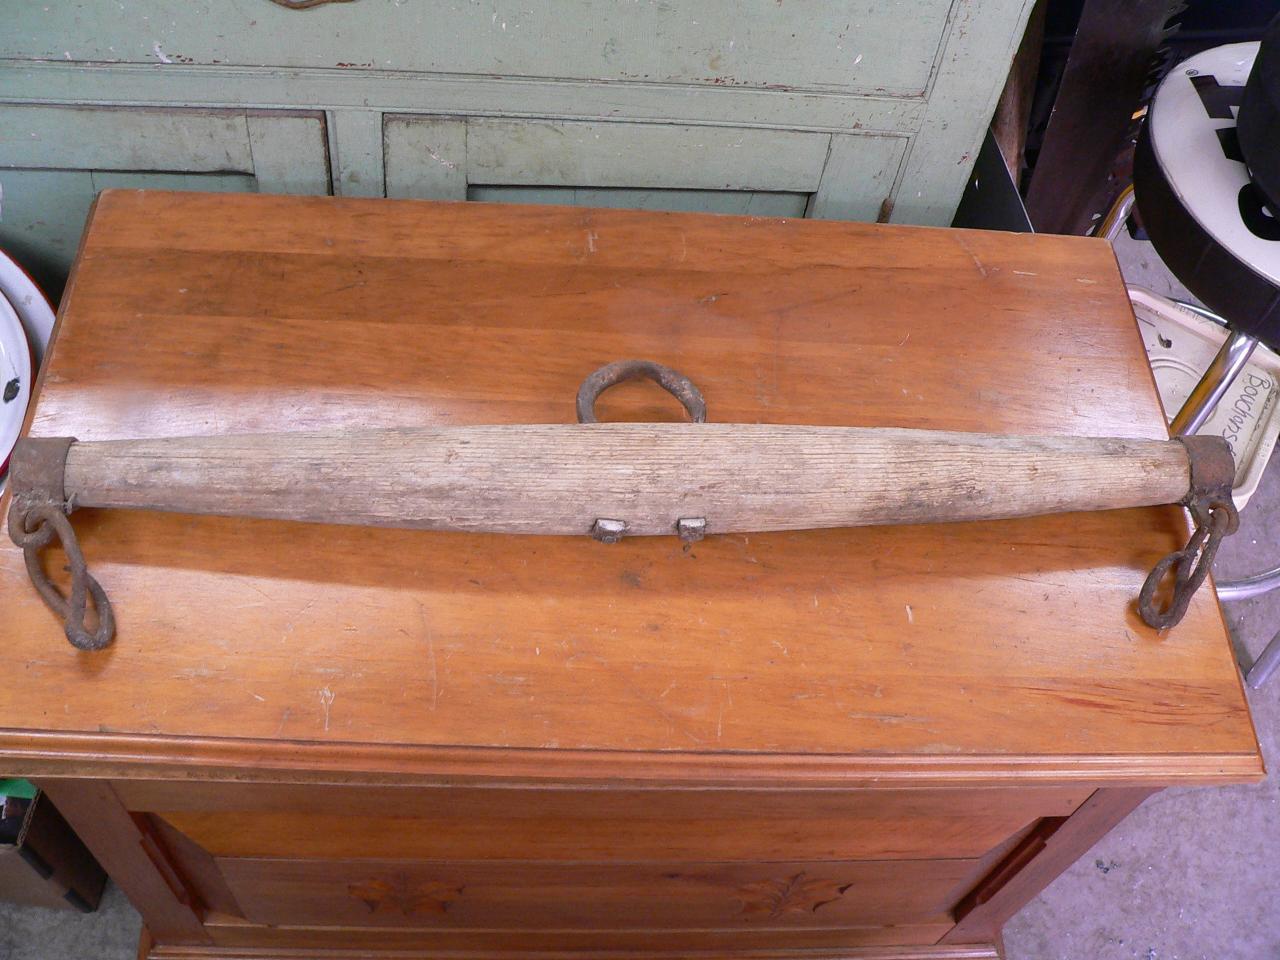 Bacu antique # 4333